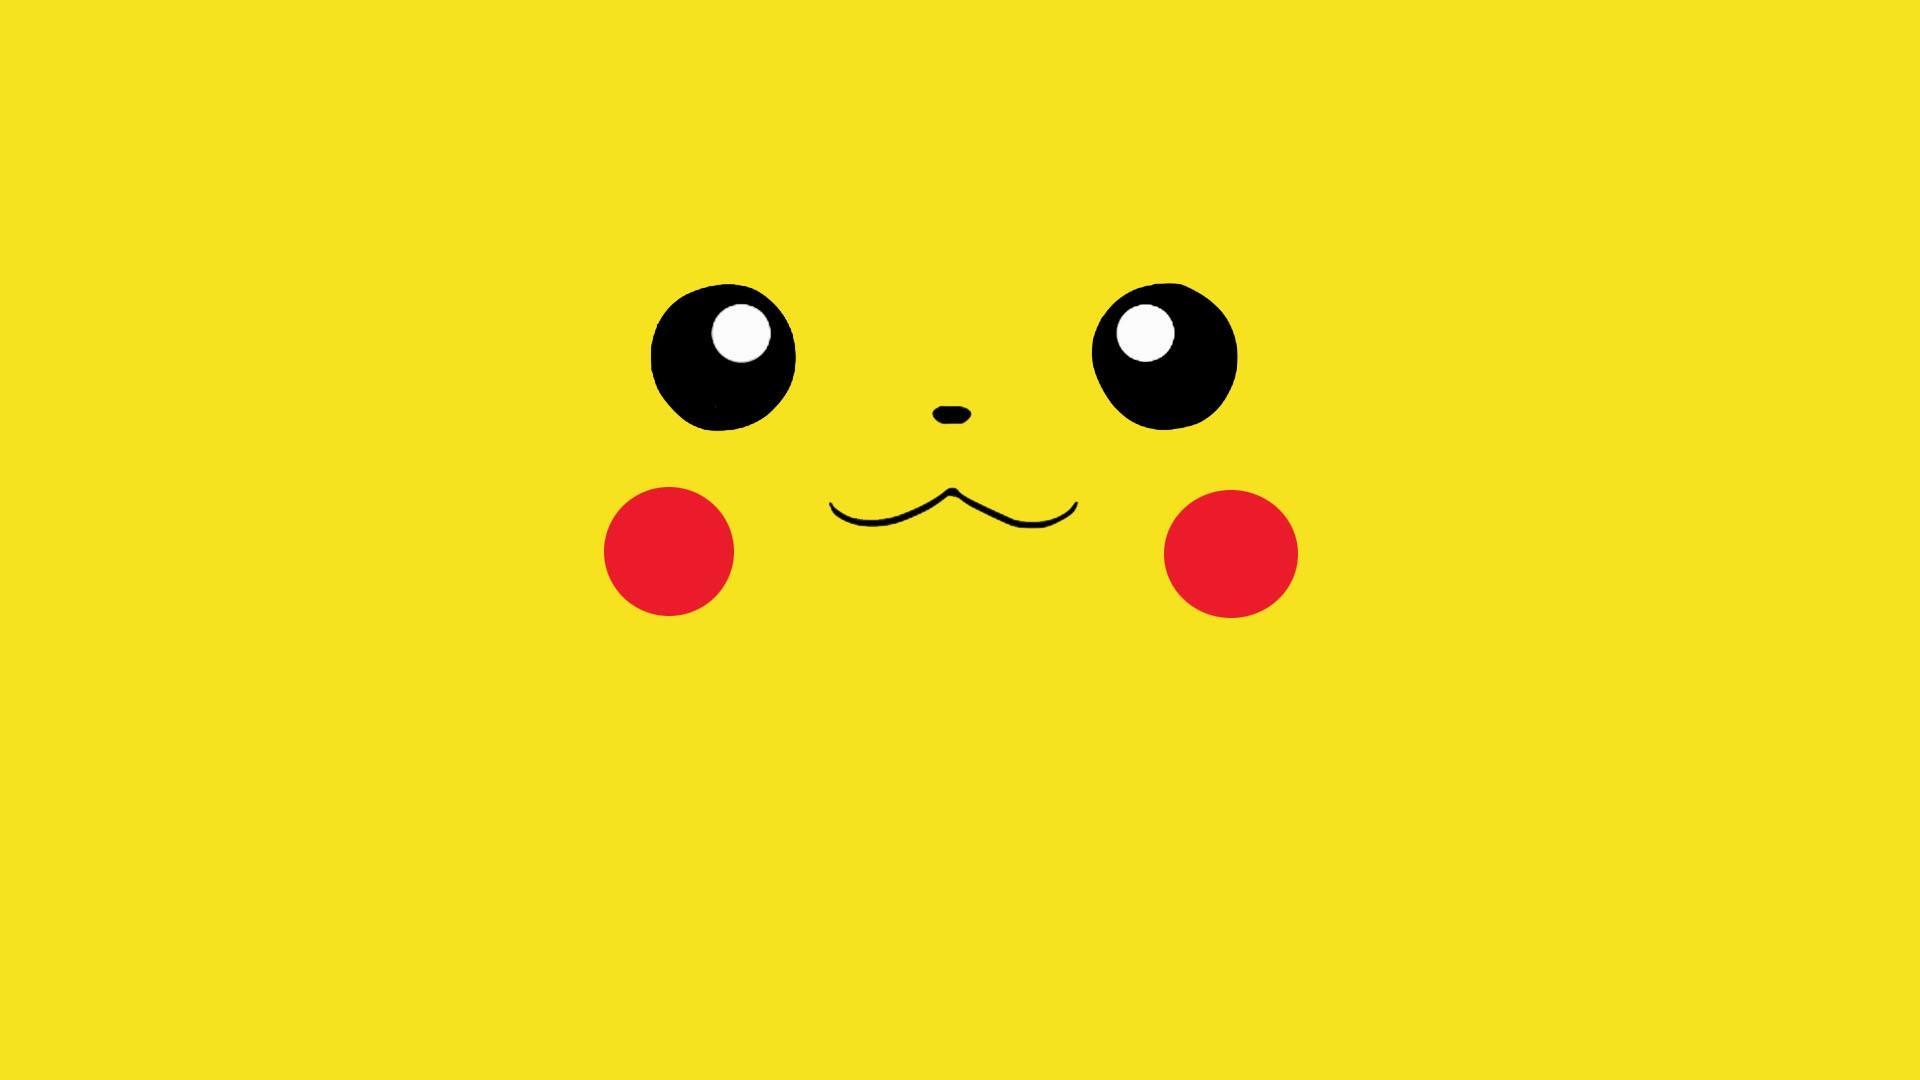 pikachu wallpaper HD Free Cute Pikachu Wallpapers HD